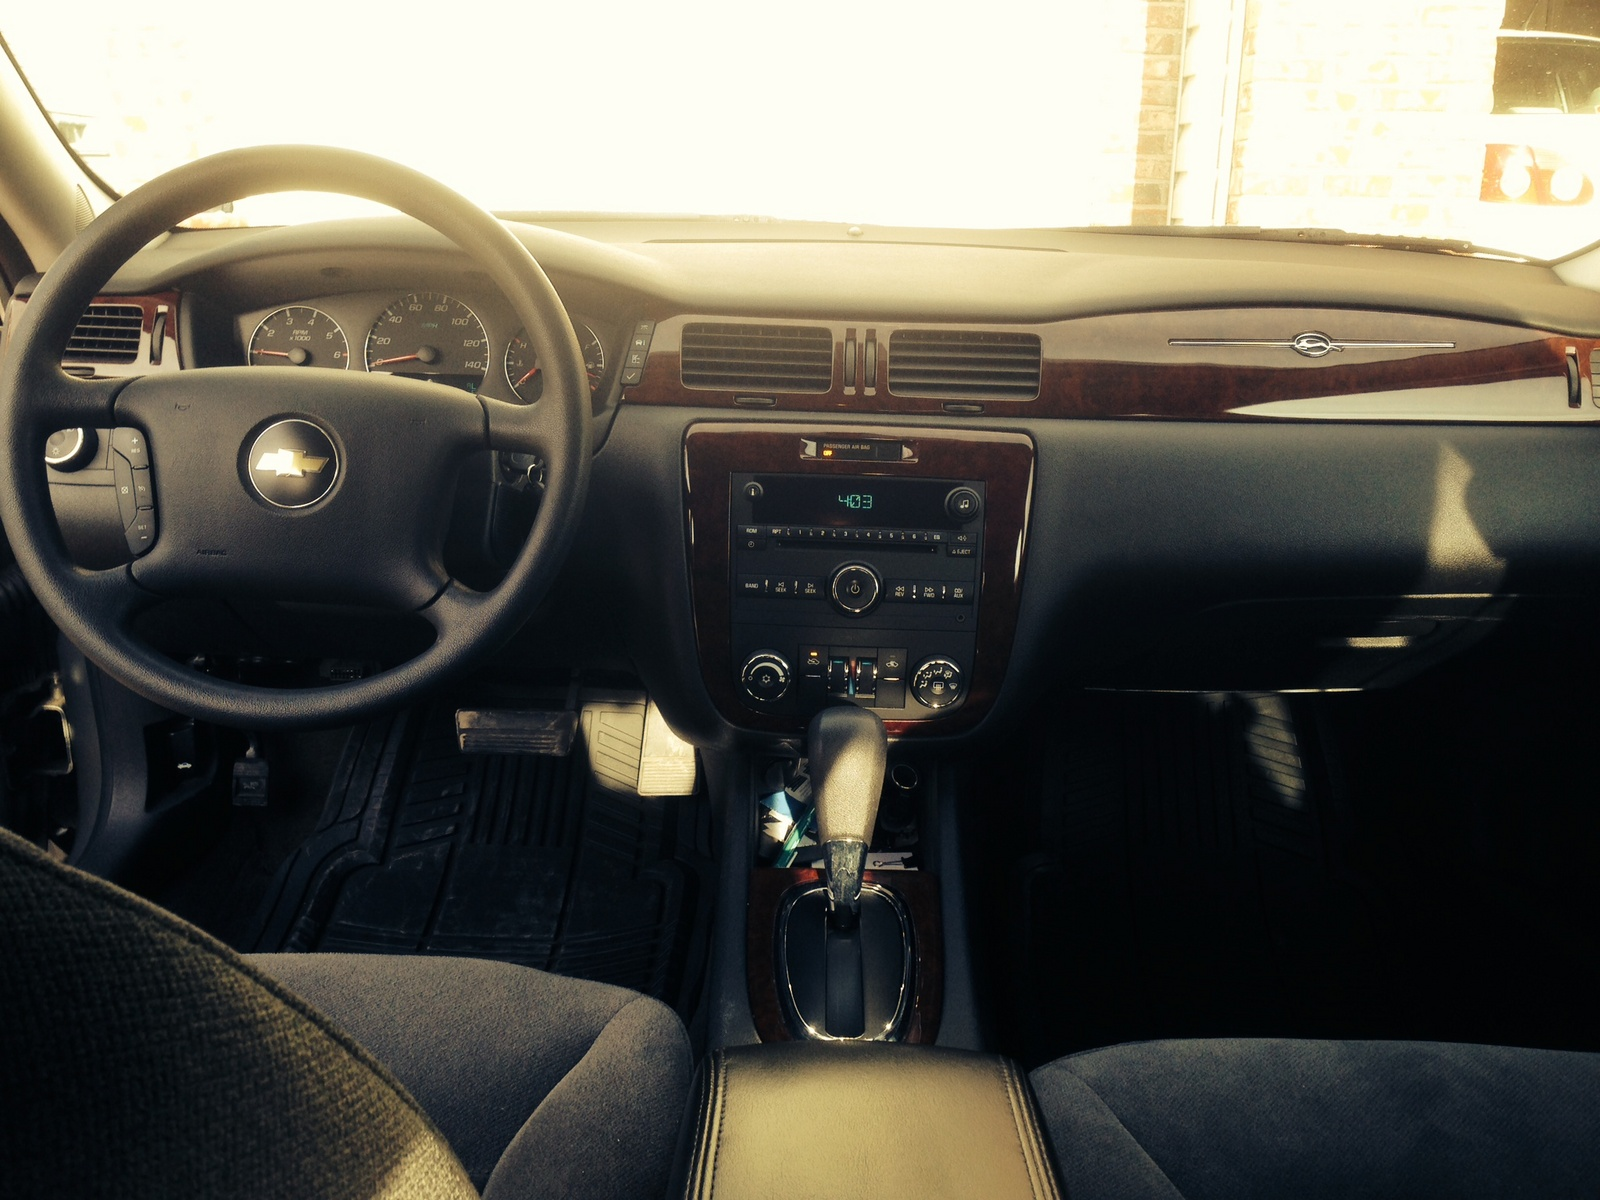 2006 chevrolet impala - pictures